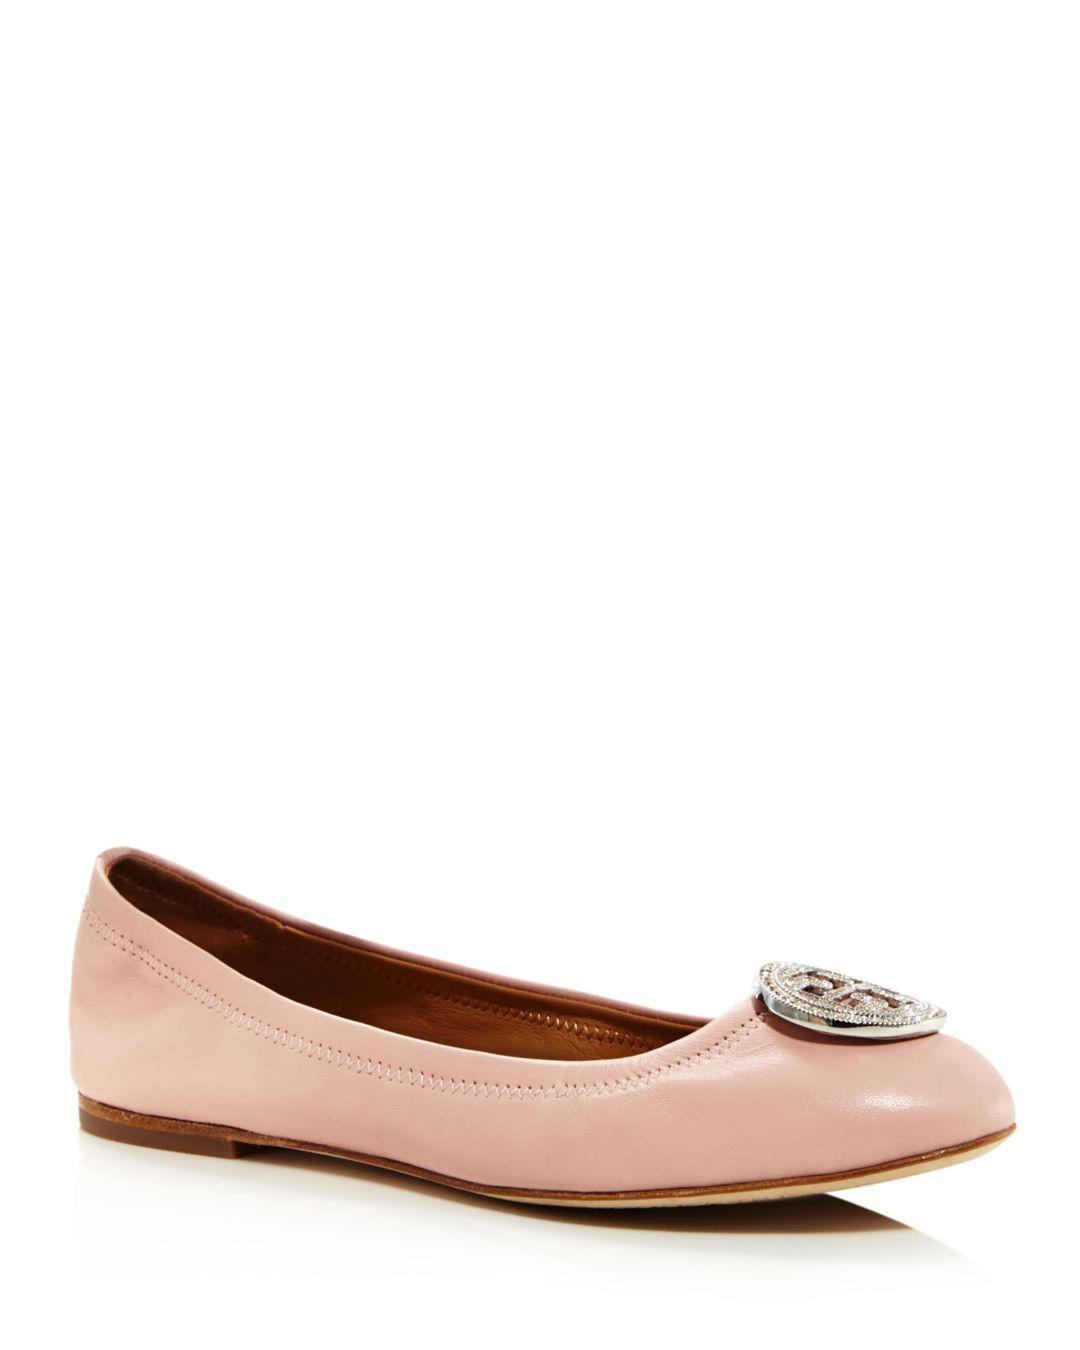 0a6359bbf449 Tory Burch. Women s Liana Round Toe Rhinestone Logo Leather Ballet Flats